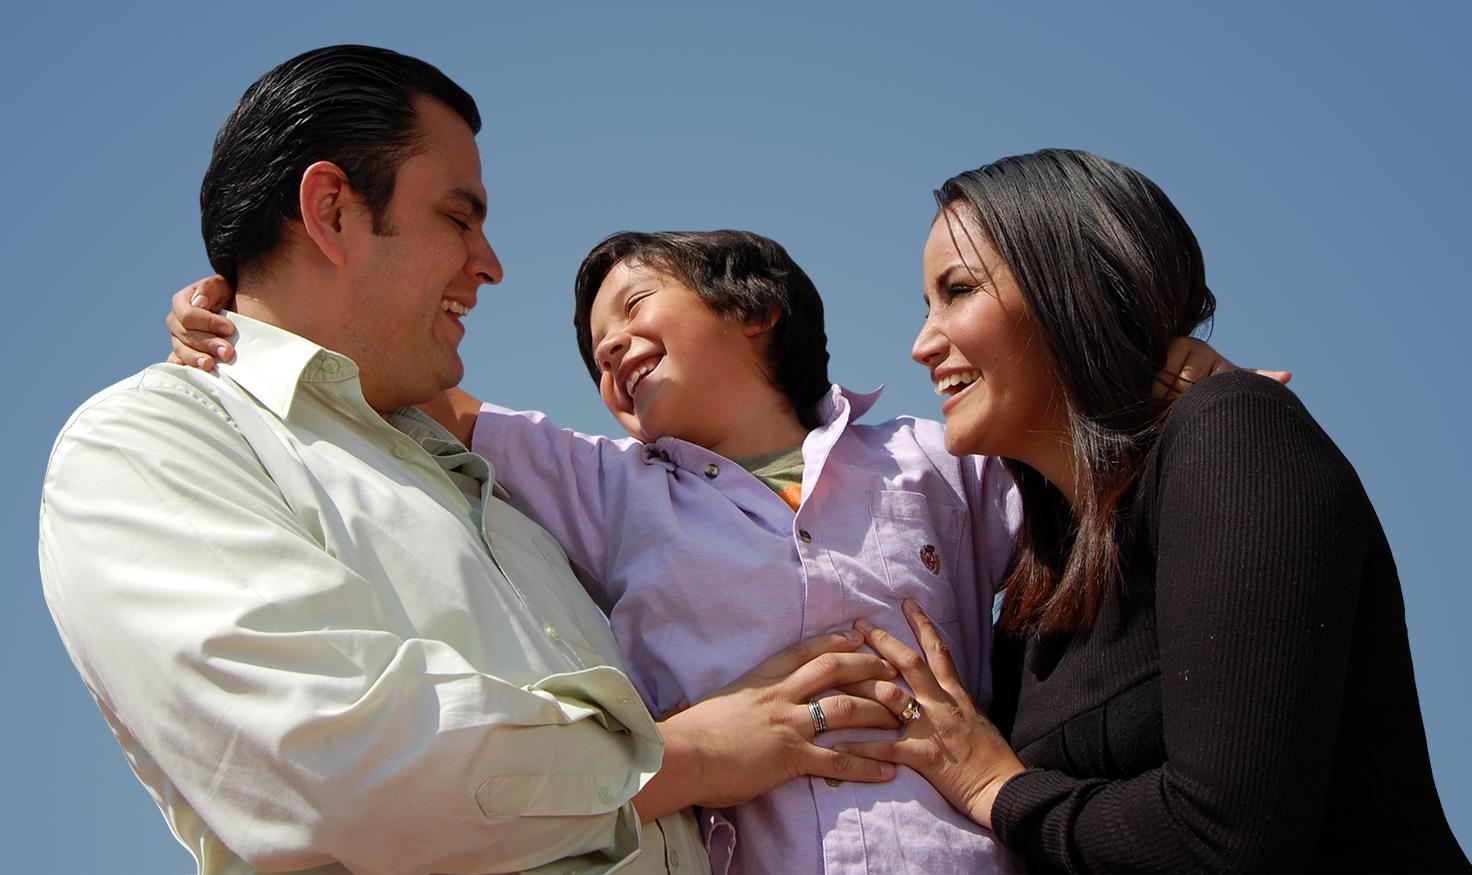 Una familia abrazándose, mamá, papá e hijo